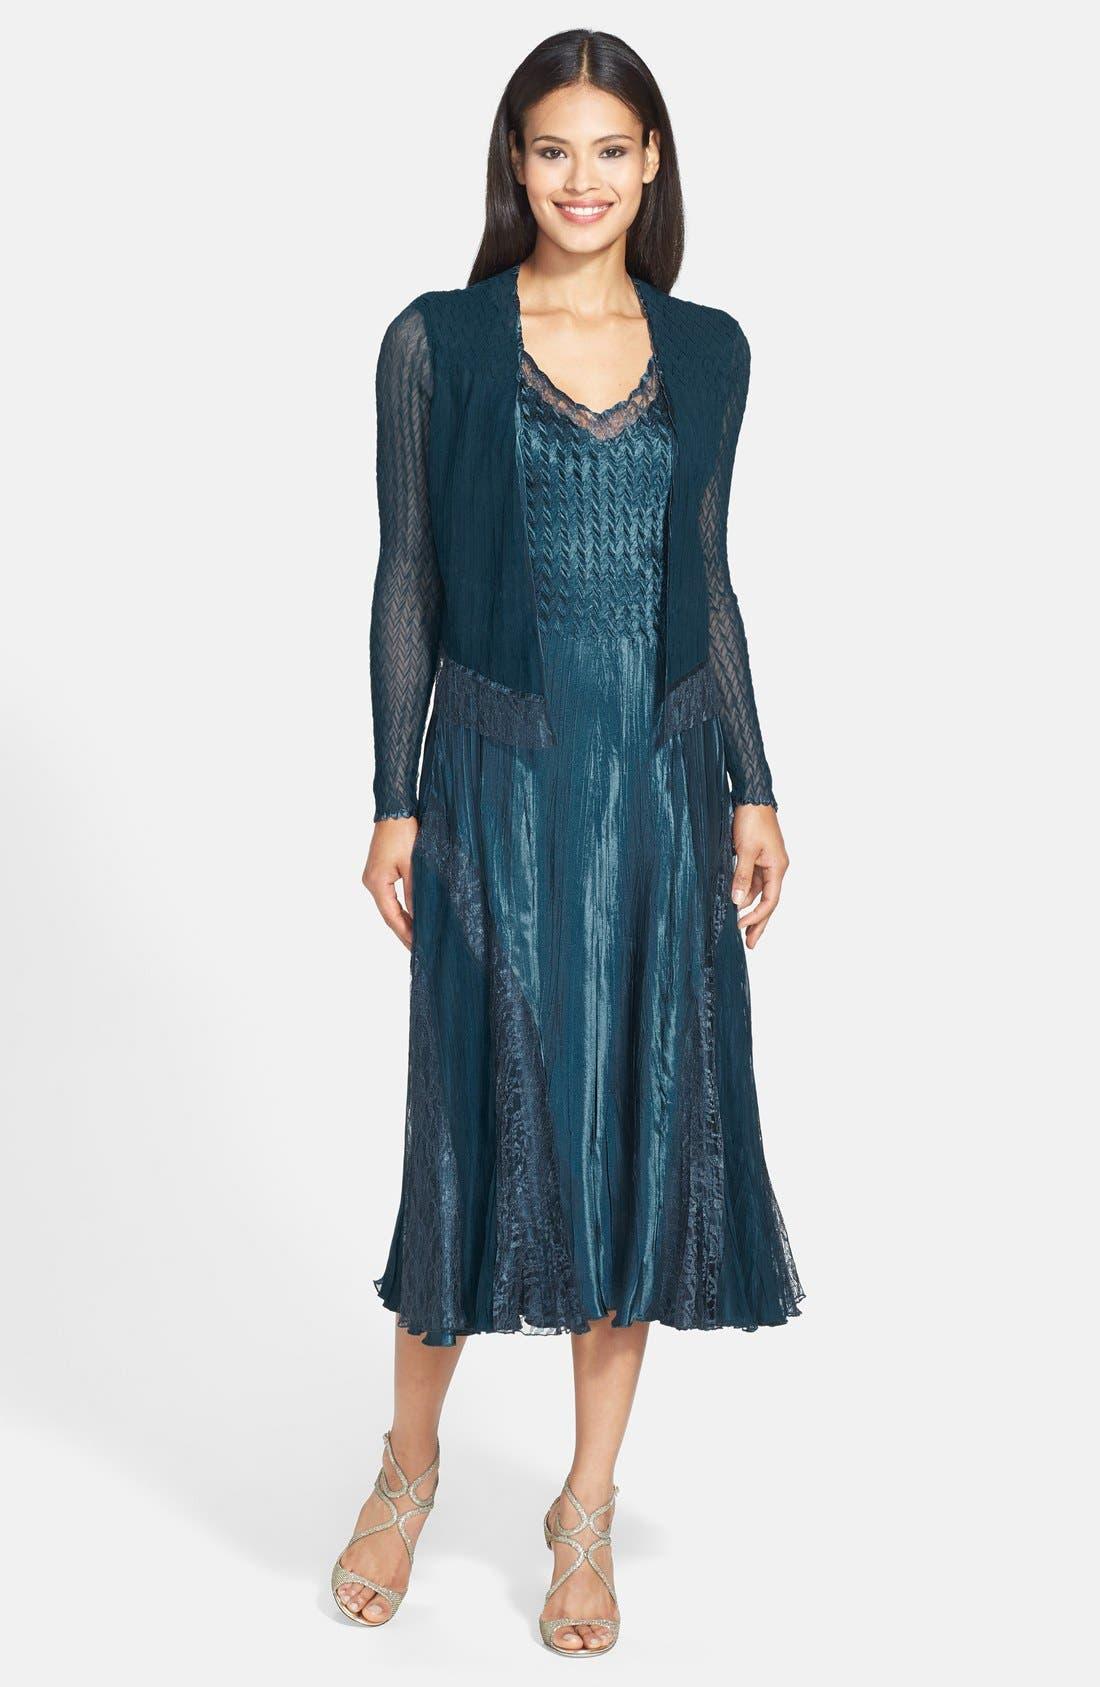 Main Image - Komarov Lace Trim Charmeuse Dress & Jacket